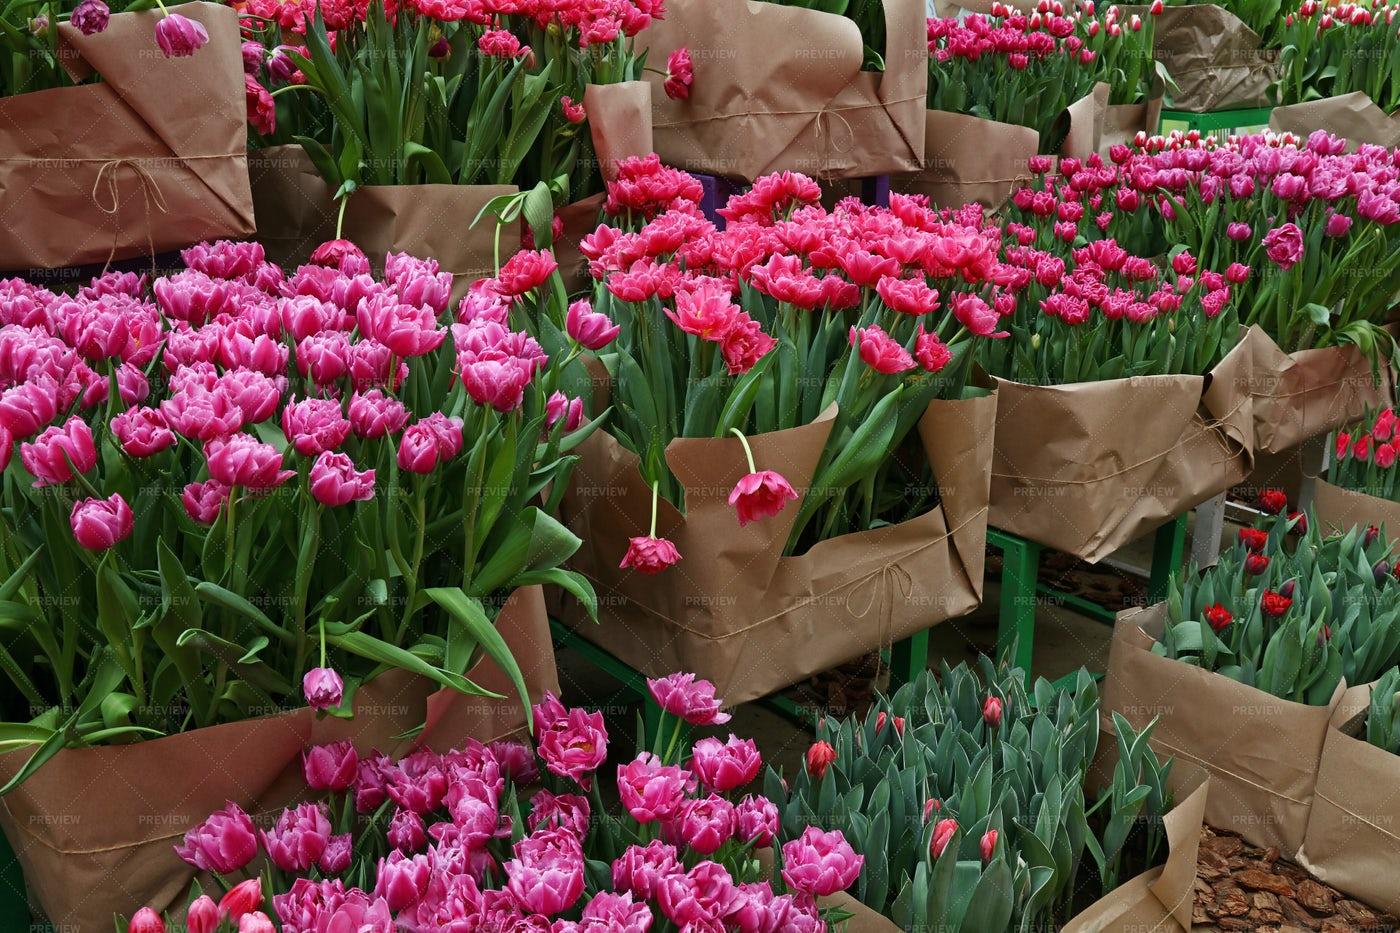 Tulip Flowers In Greenhouse: Stock Photos